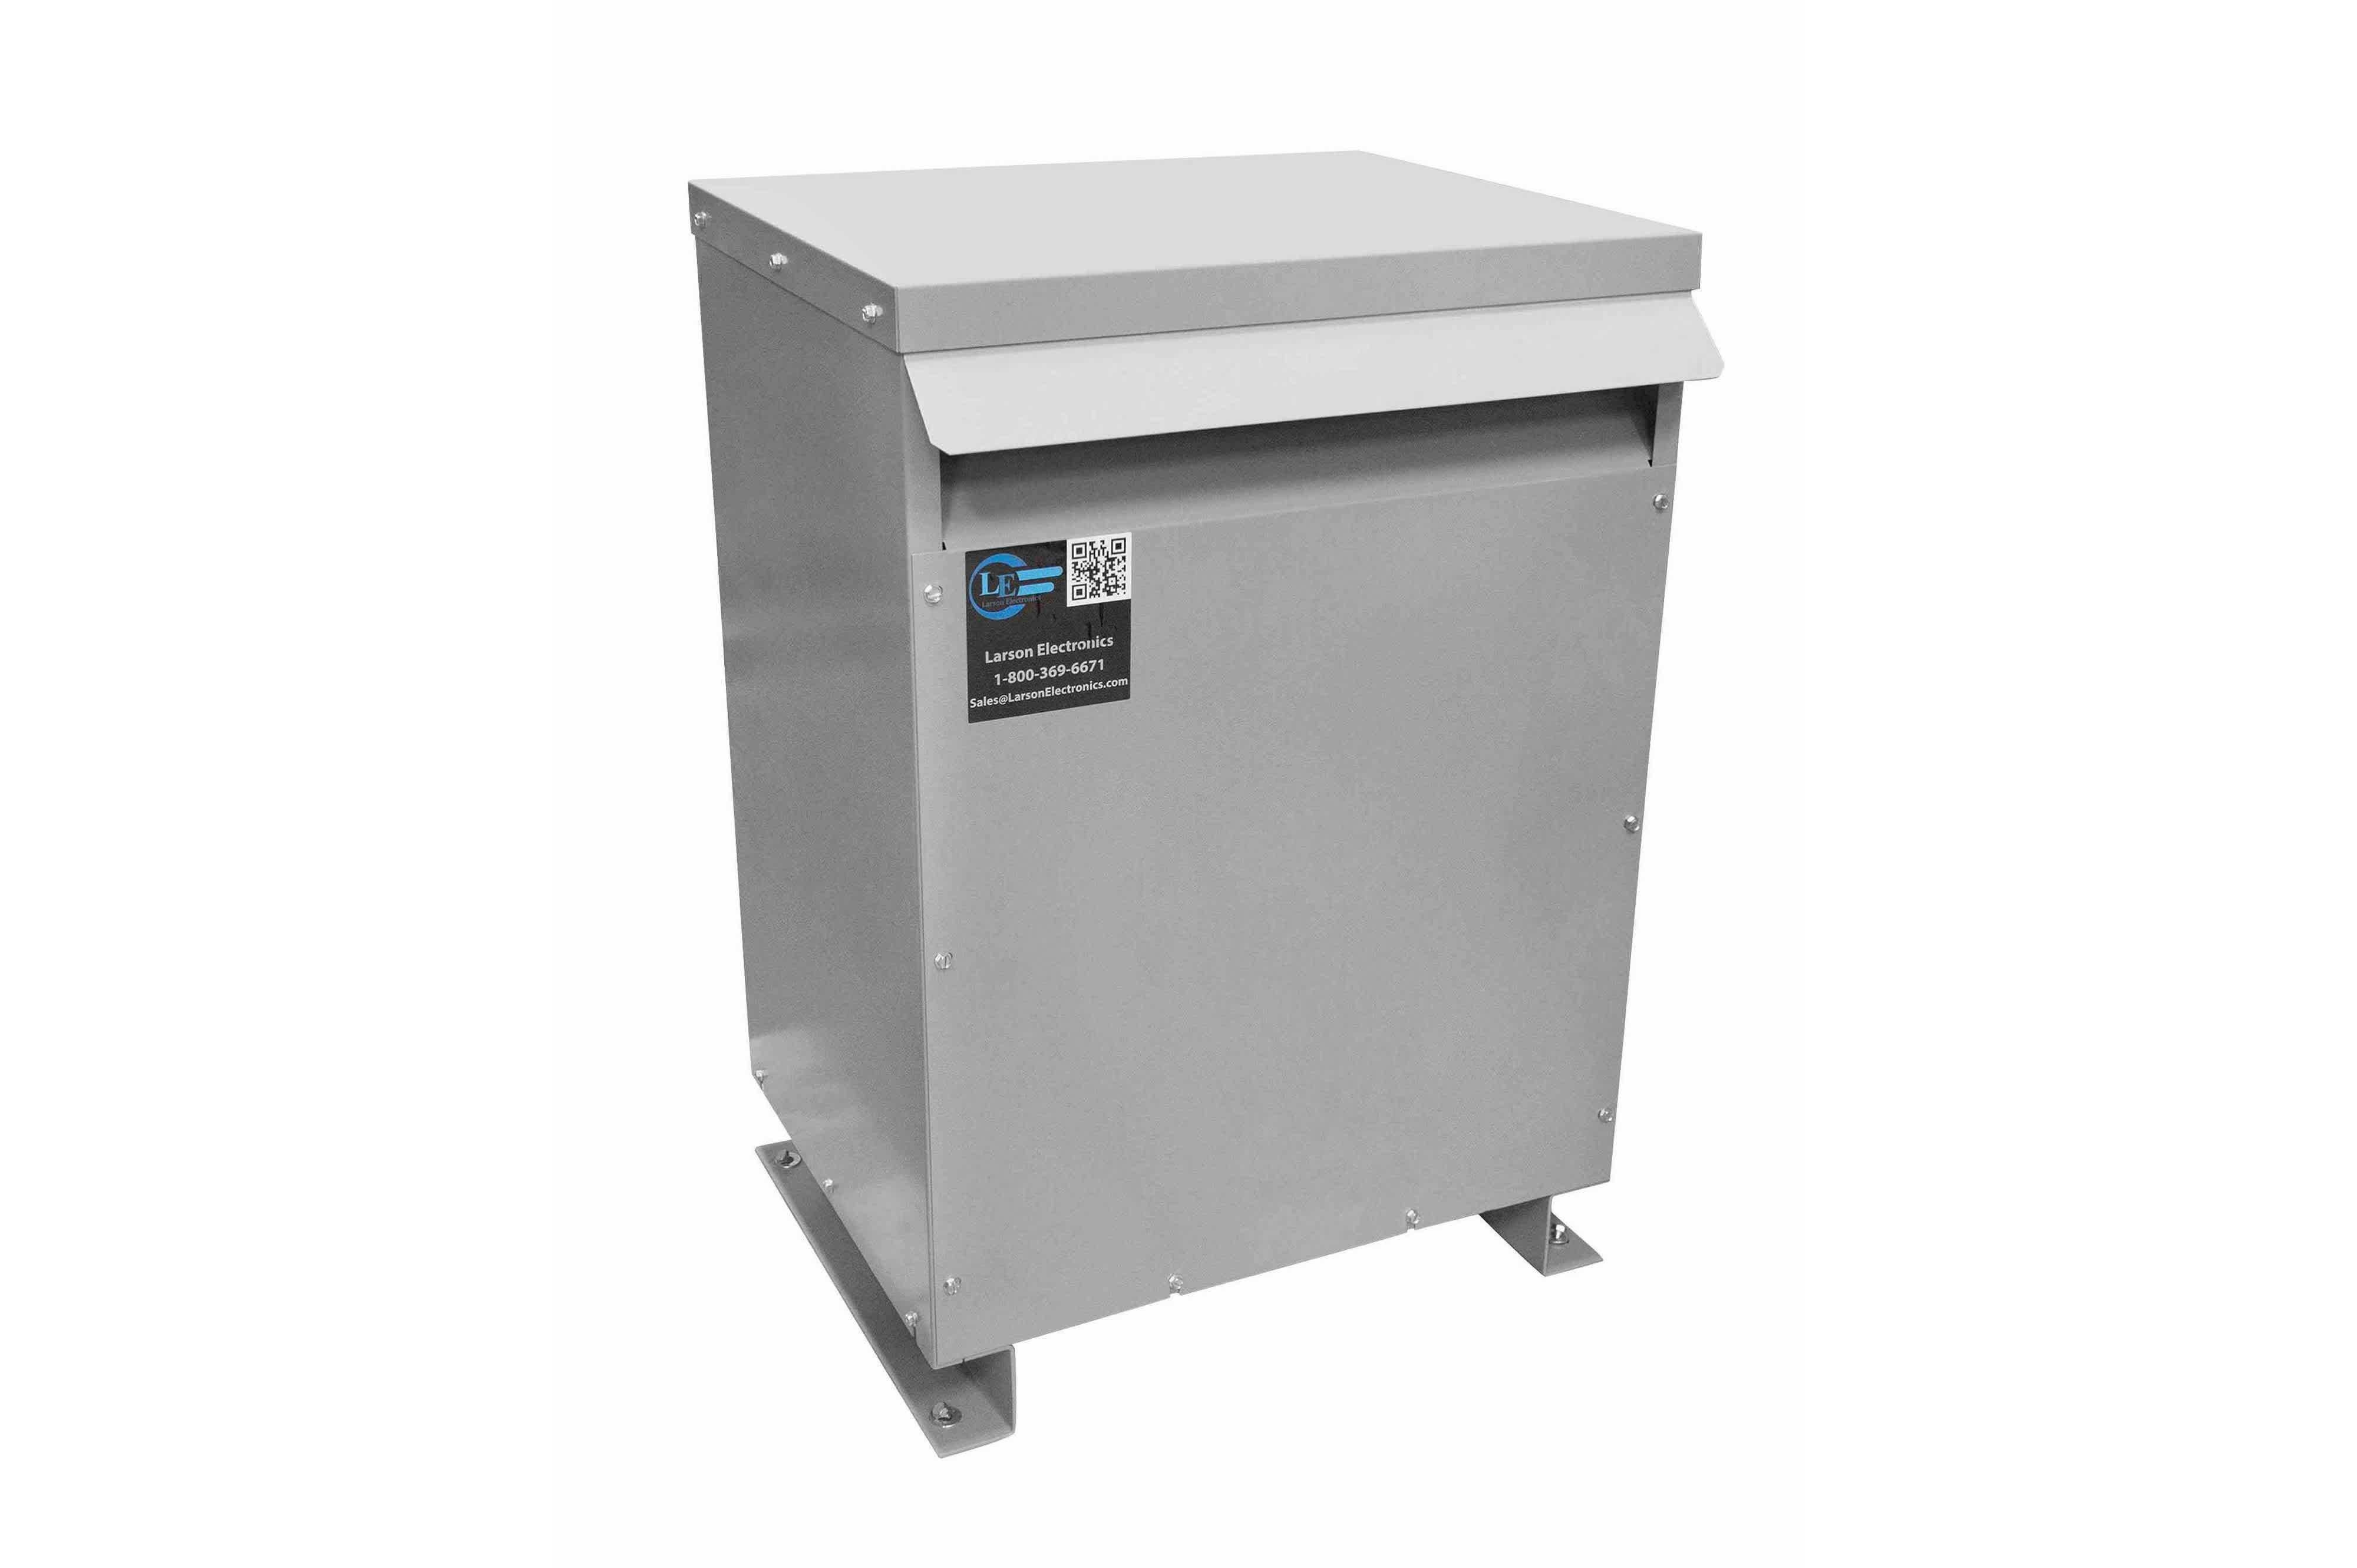 300 kVA 3PH Isolation Transformer, 600V Wye Primary, 415Y/240 Wye-N Secondary, N3R, Ventilated, 60 Hz